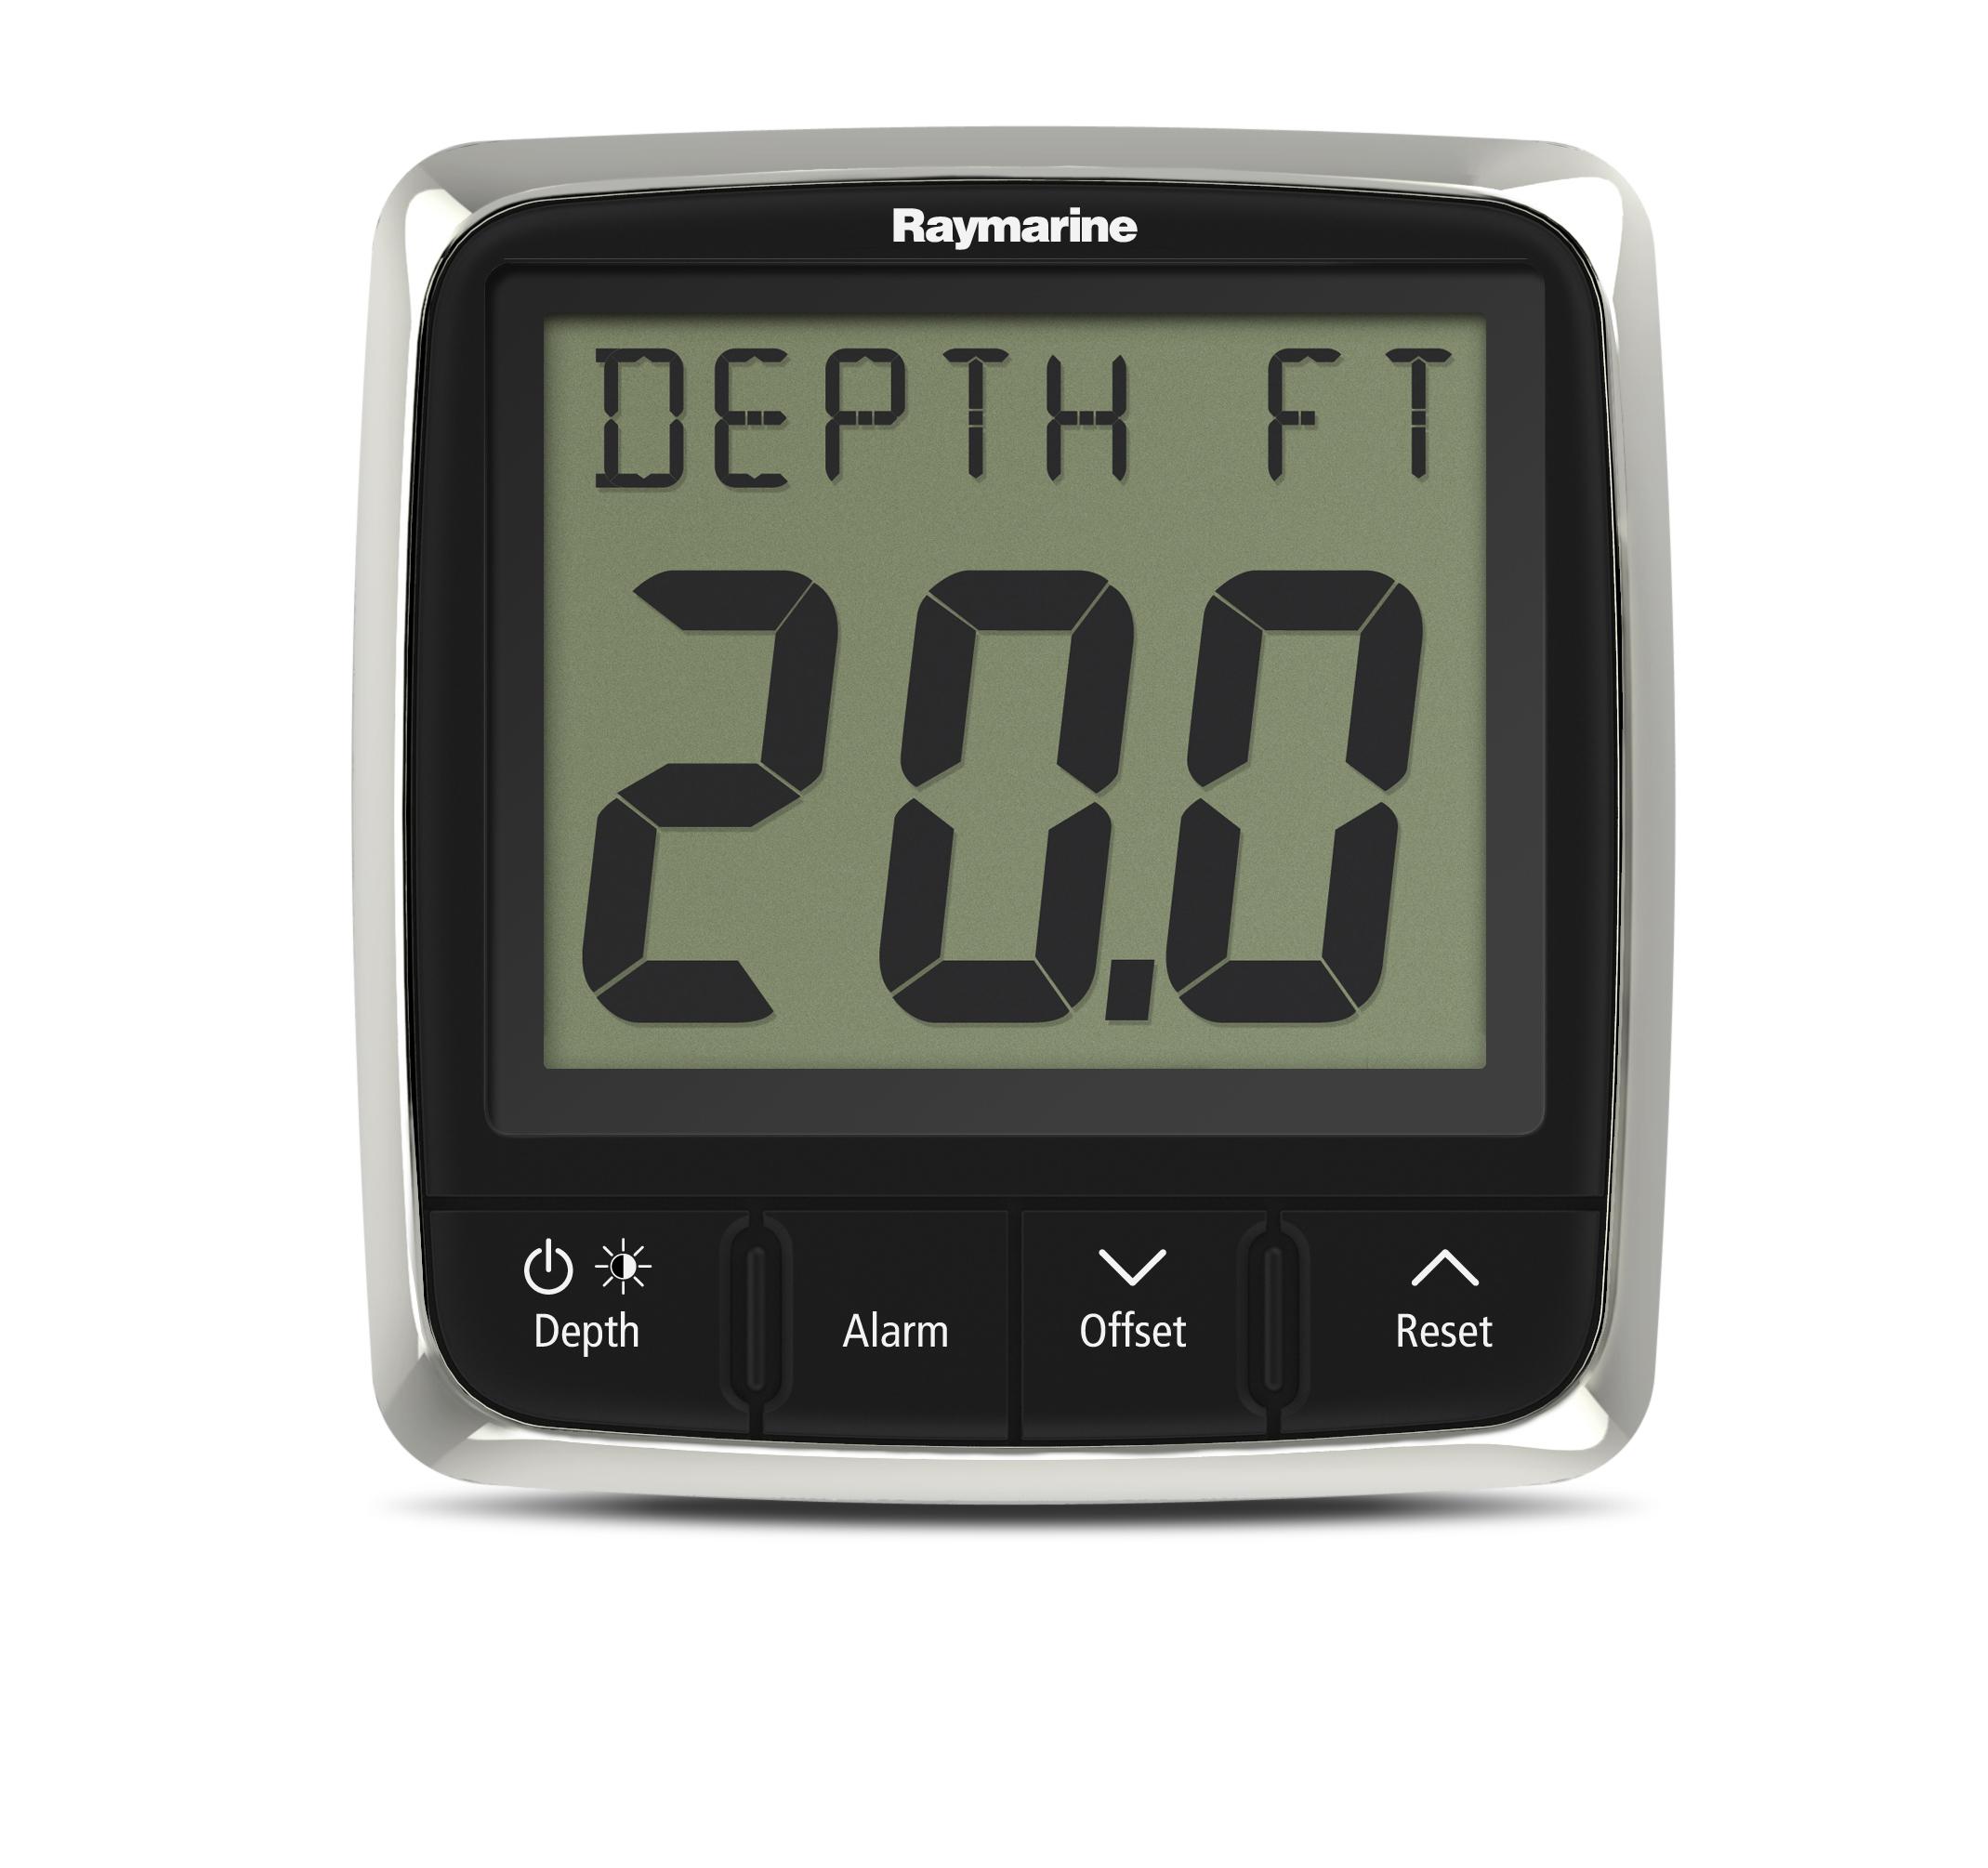 i50 depth front instrument display